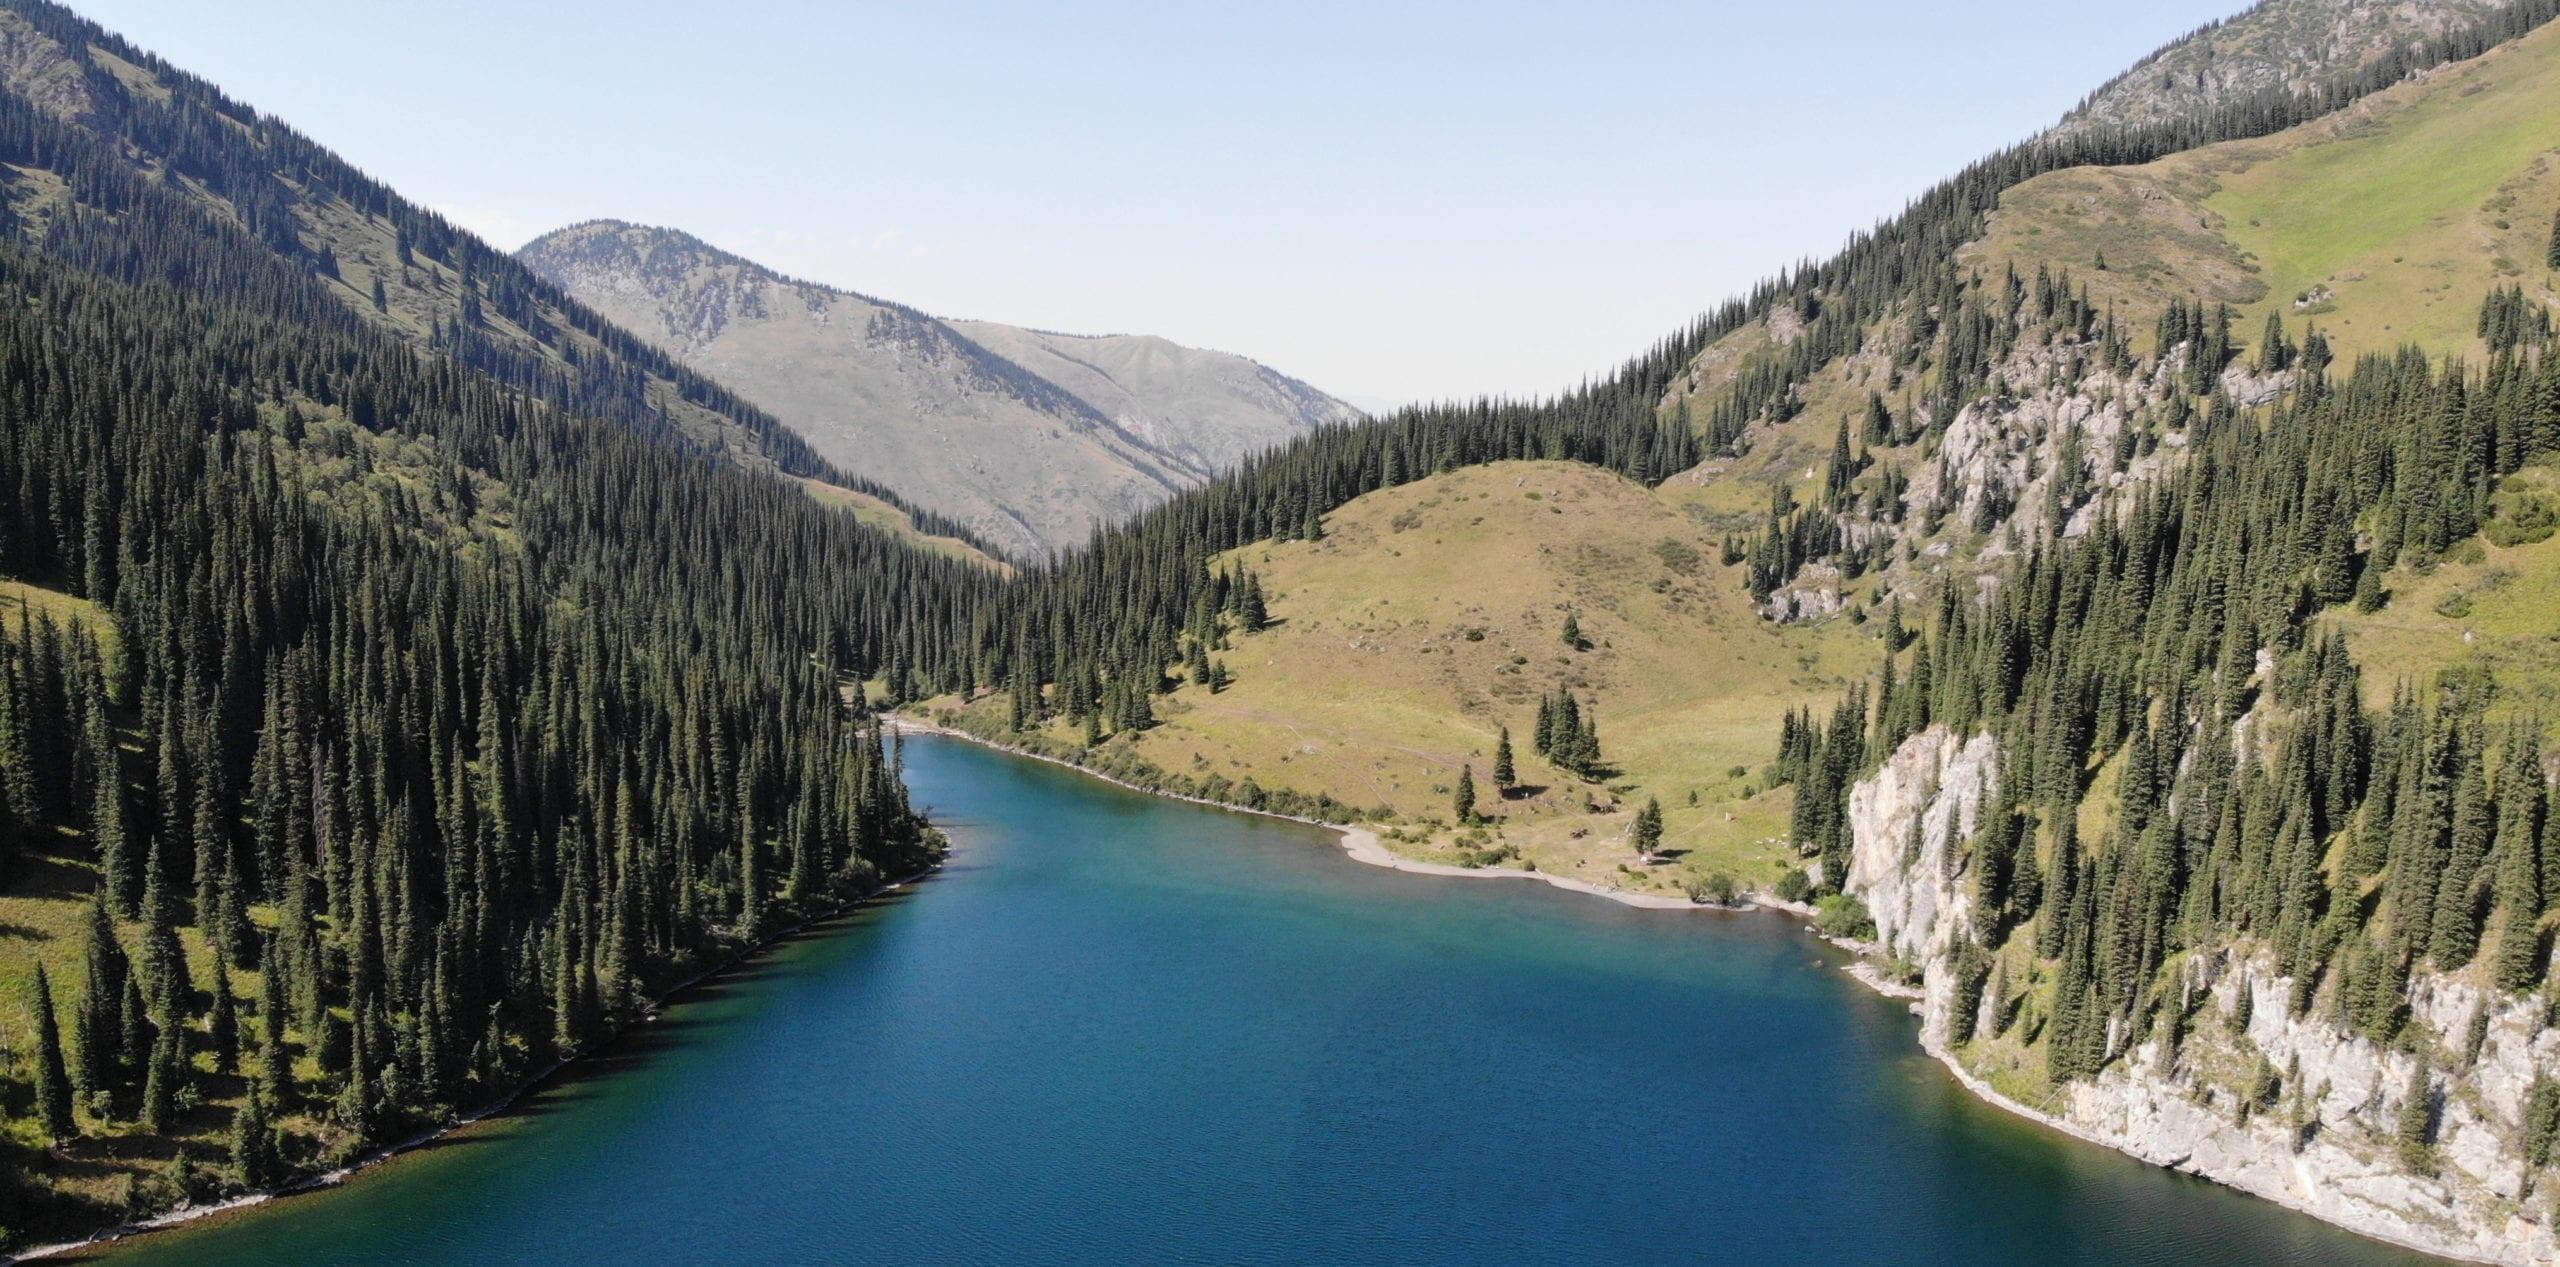 Kazak lake